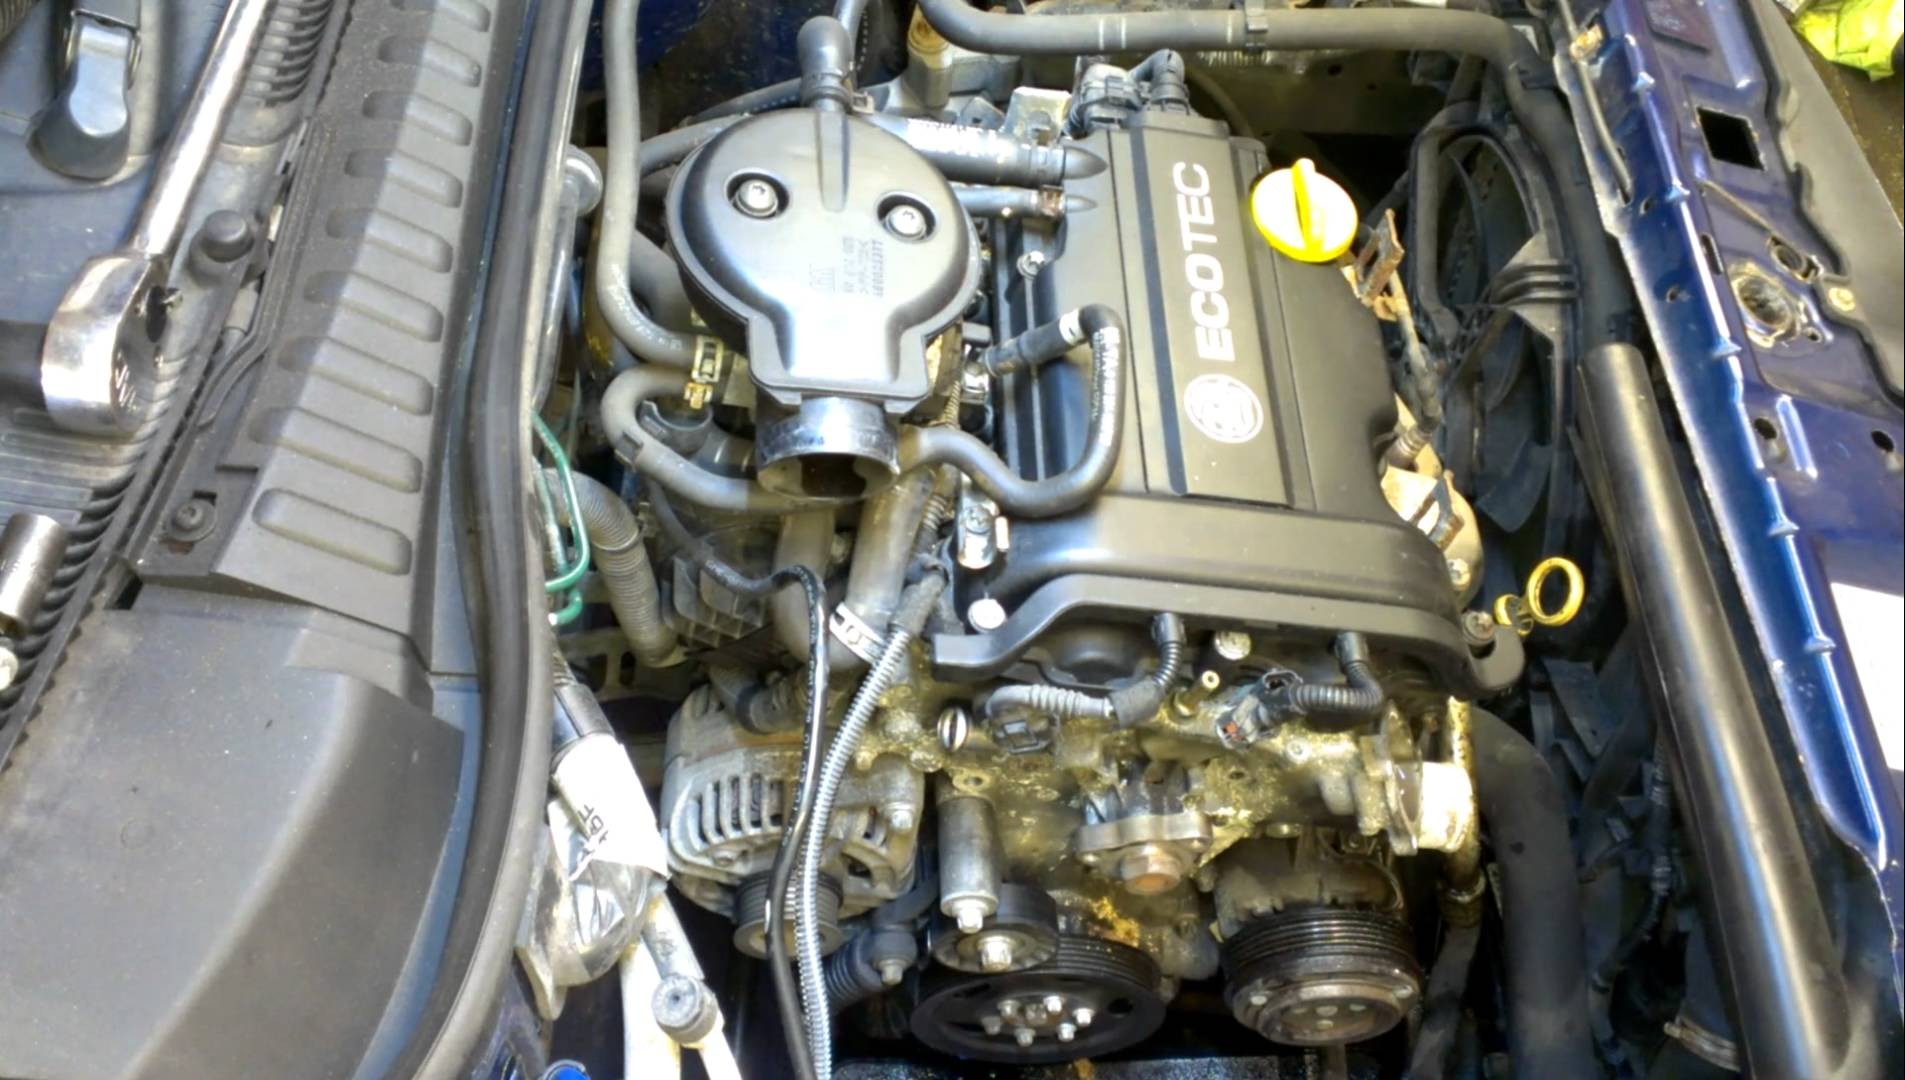 Vauxhall Corsa 1 2 Engine Diagram Vauxhall Corsa Water Pump Dismantle Part 1 Of Vauxhall Corsa 1 2 Engine Diagram